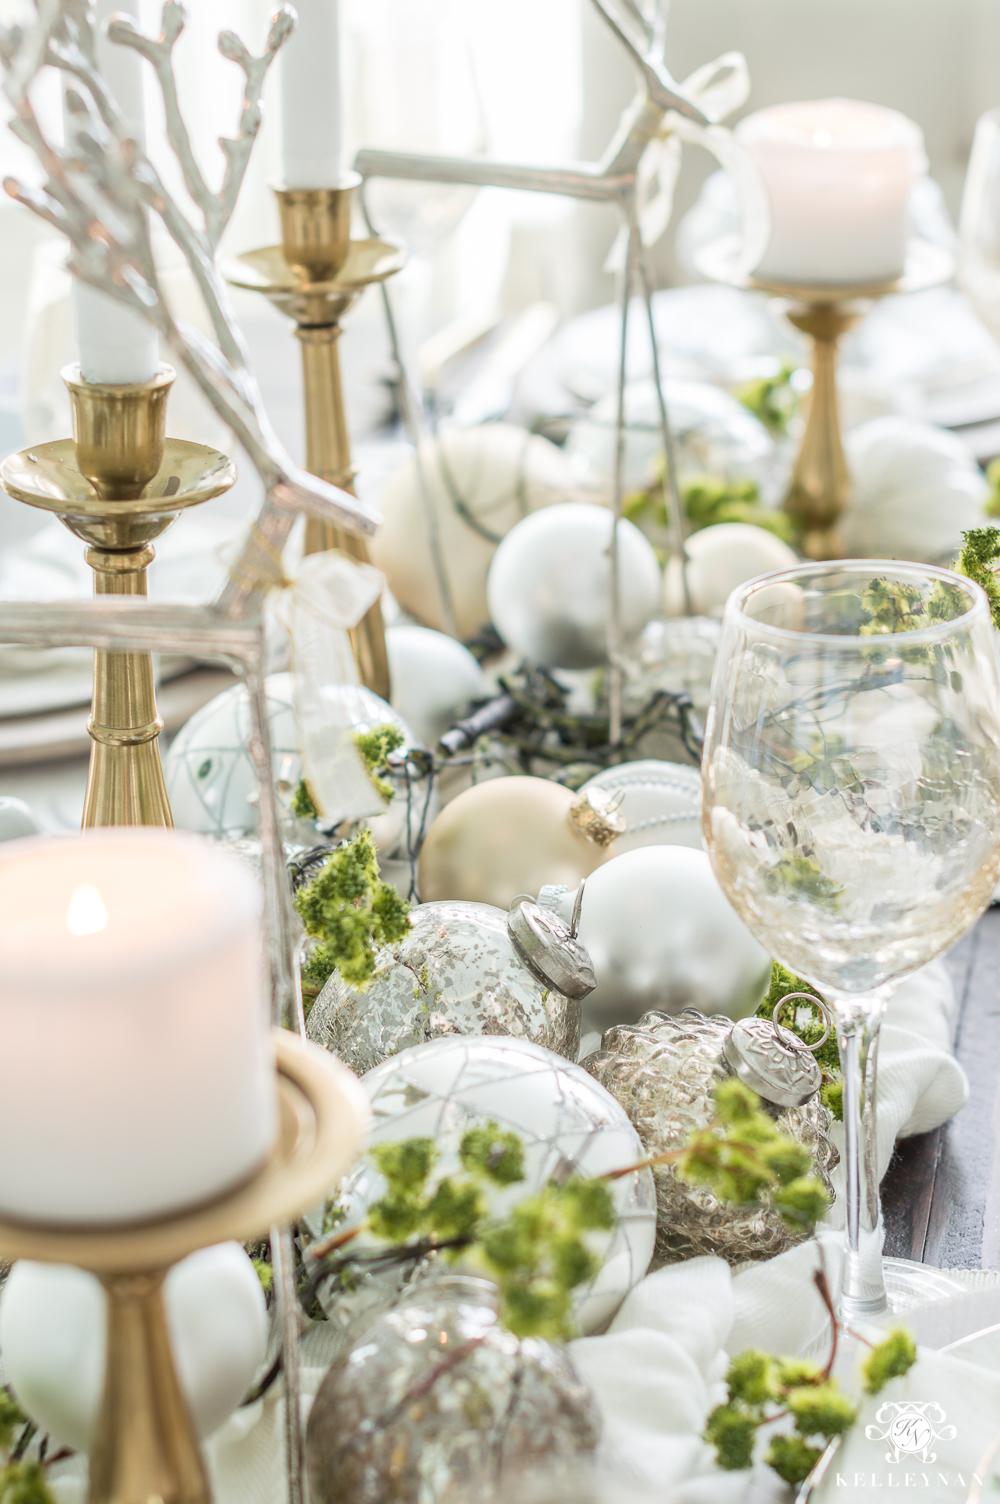 Elegant Christmas tablescape centerpiece ideas and inspiration